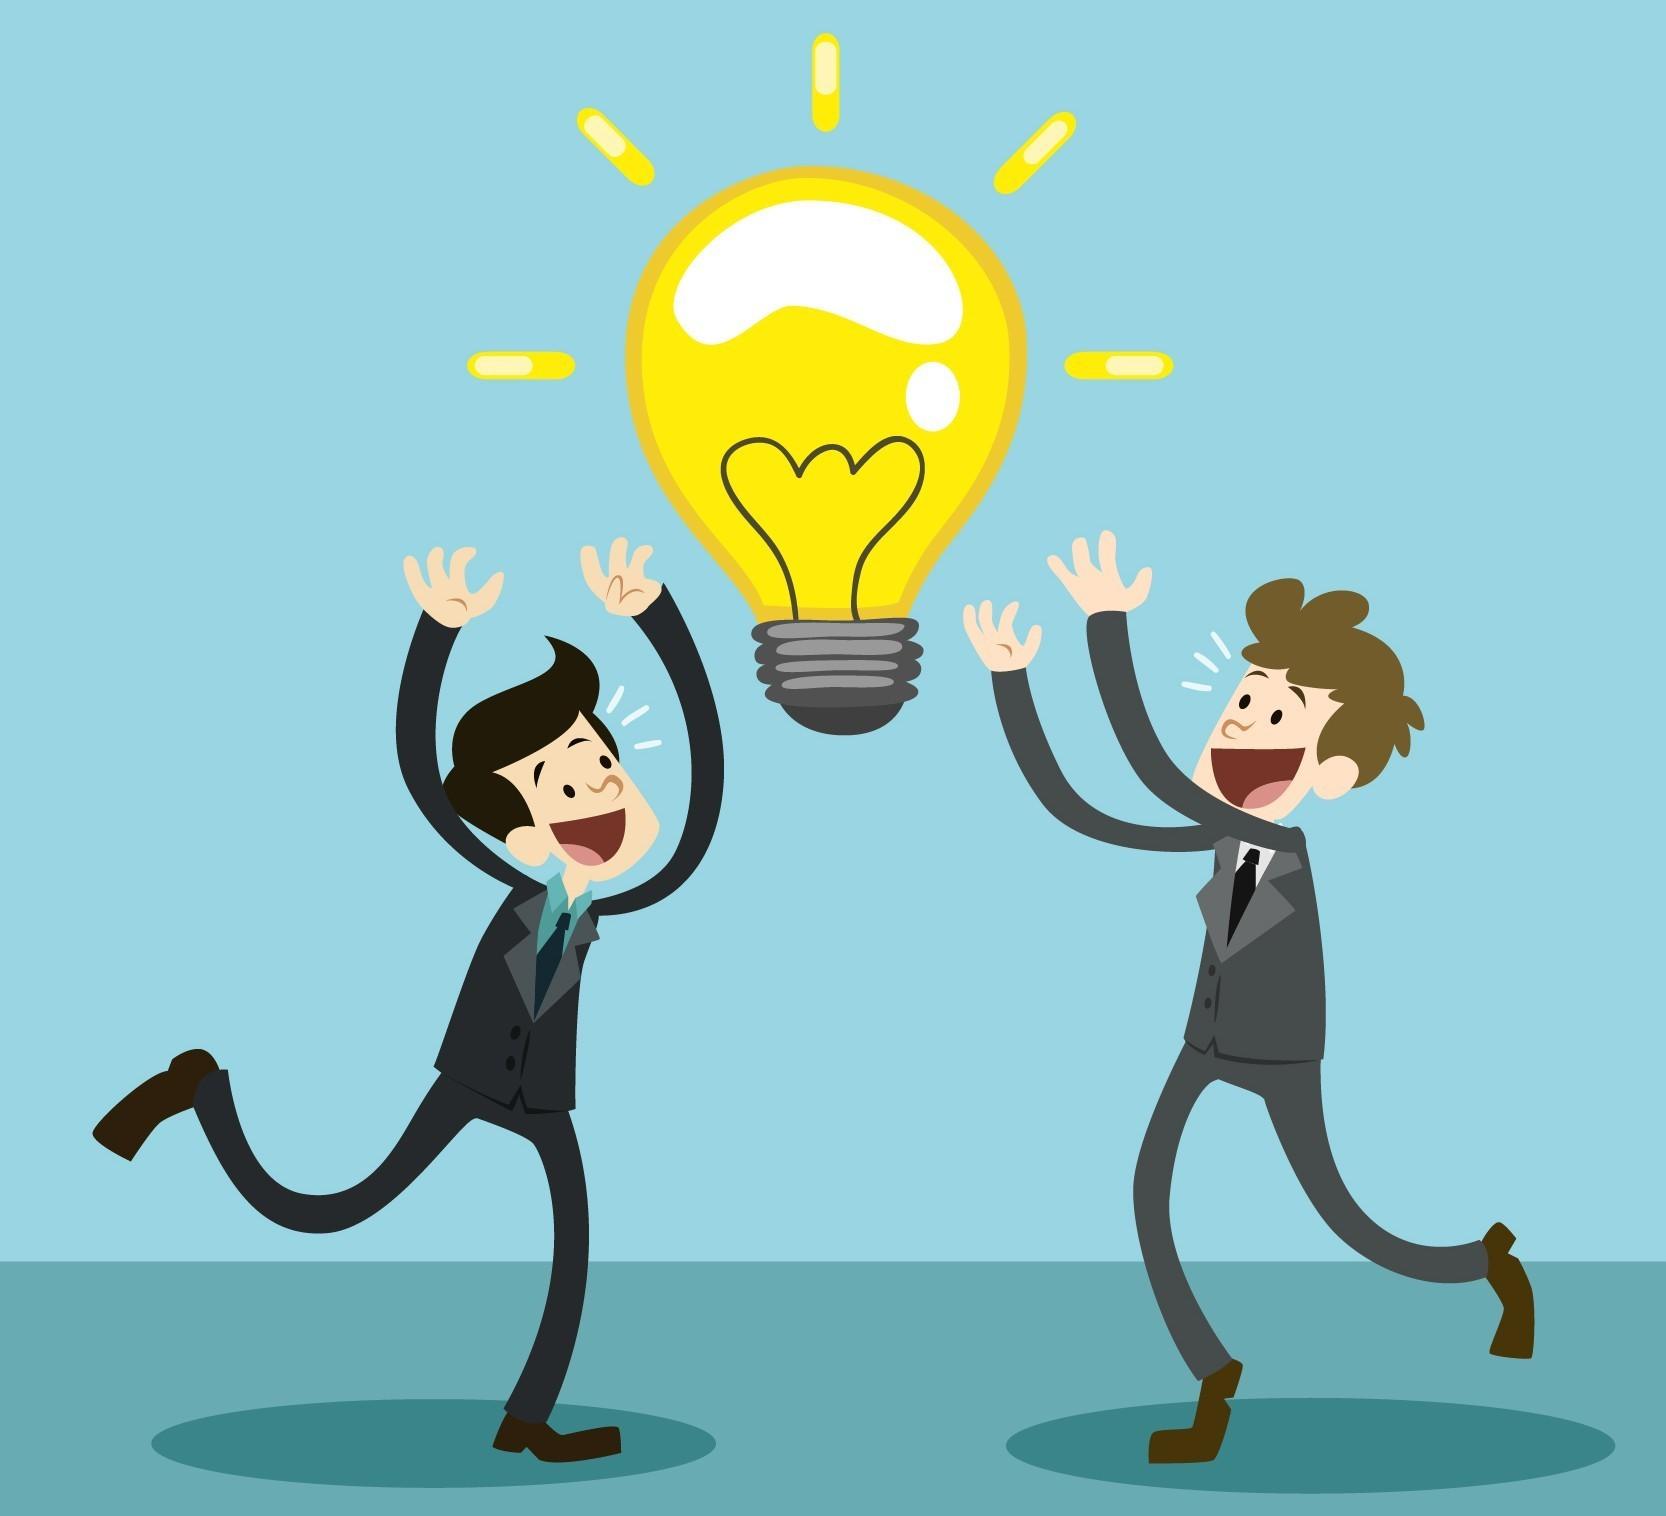 Customer Service - Smart savings tips